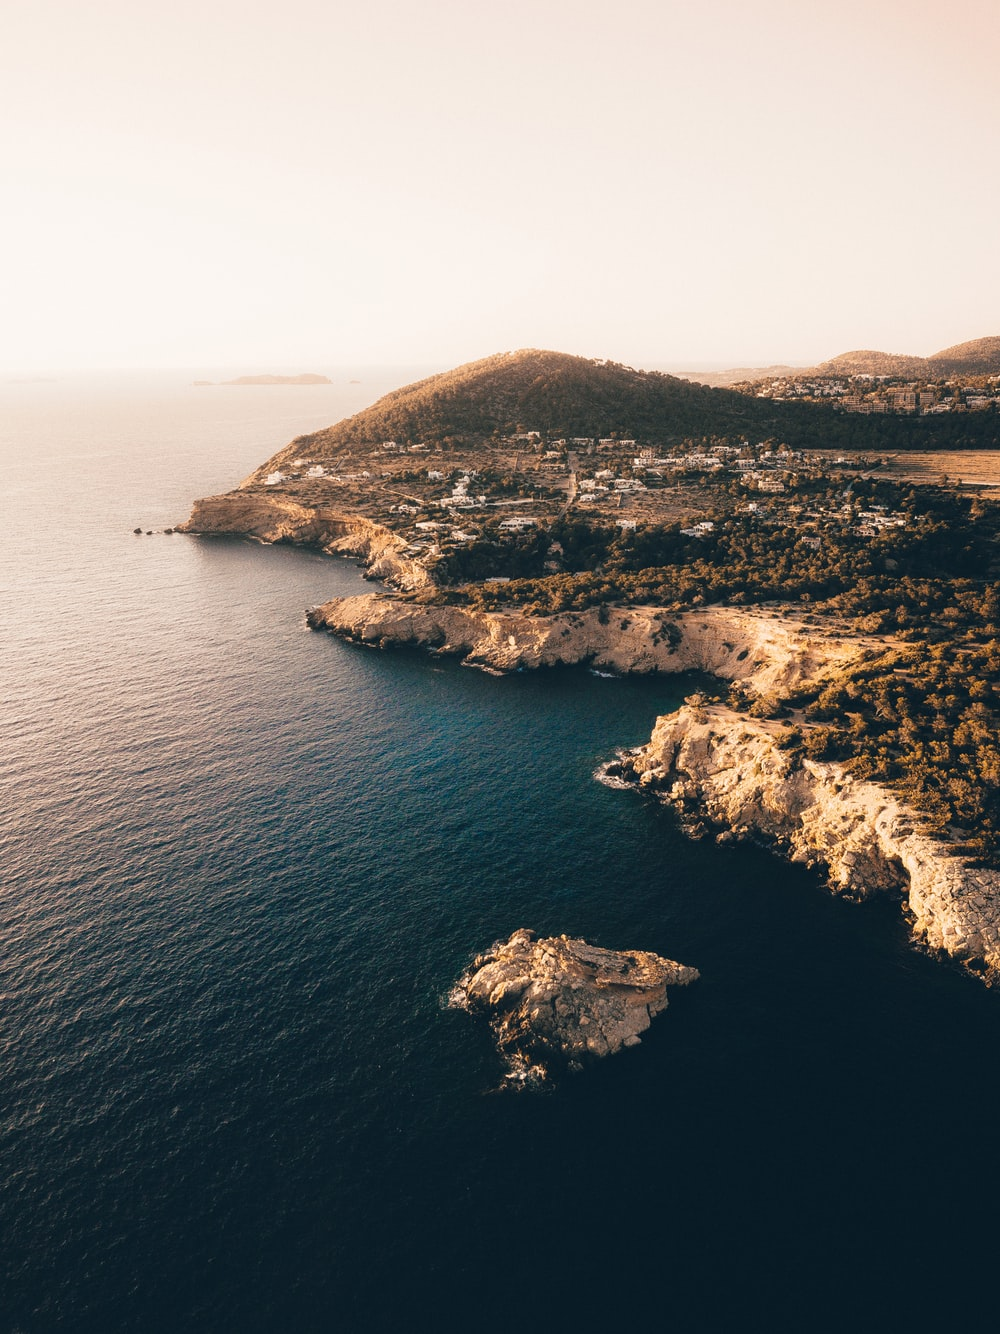 aerial photography of coastline near green trees